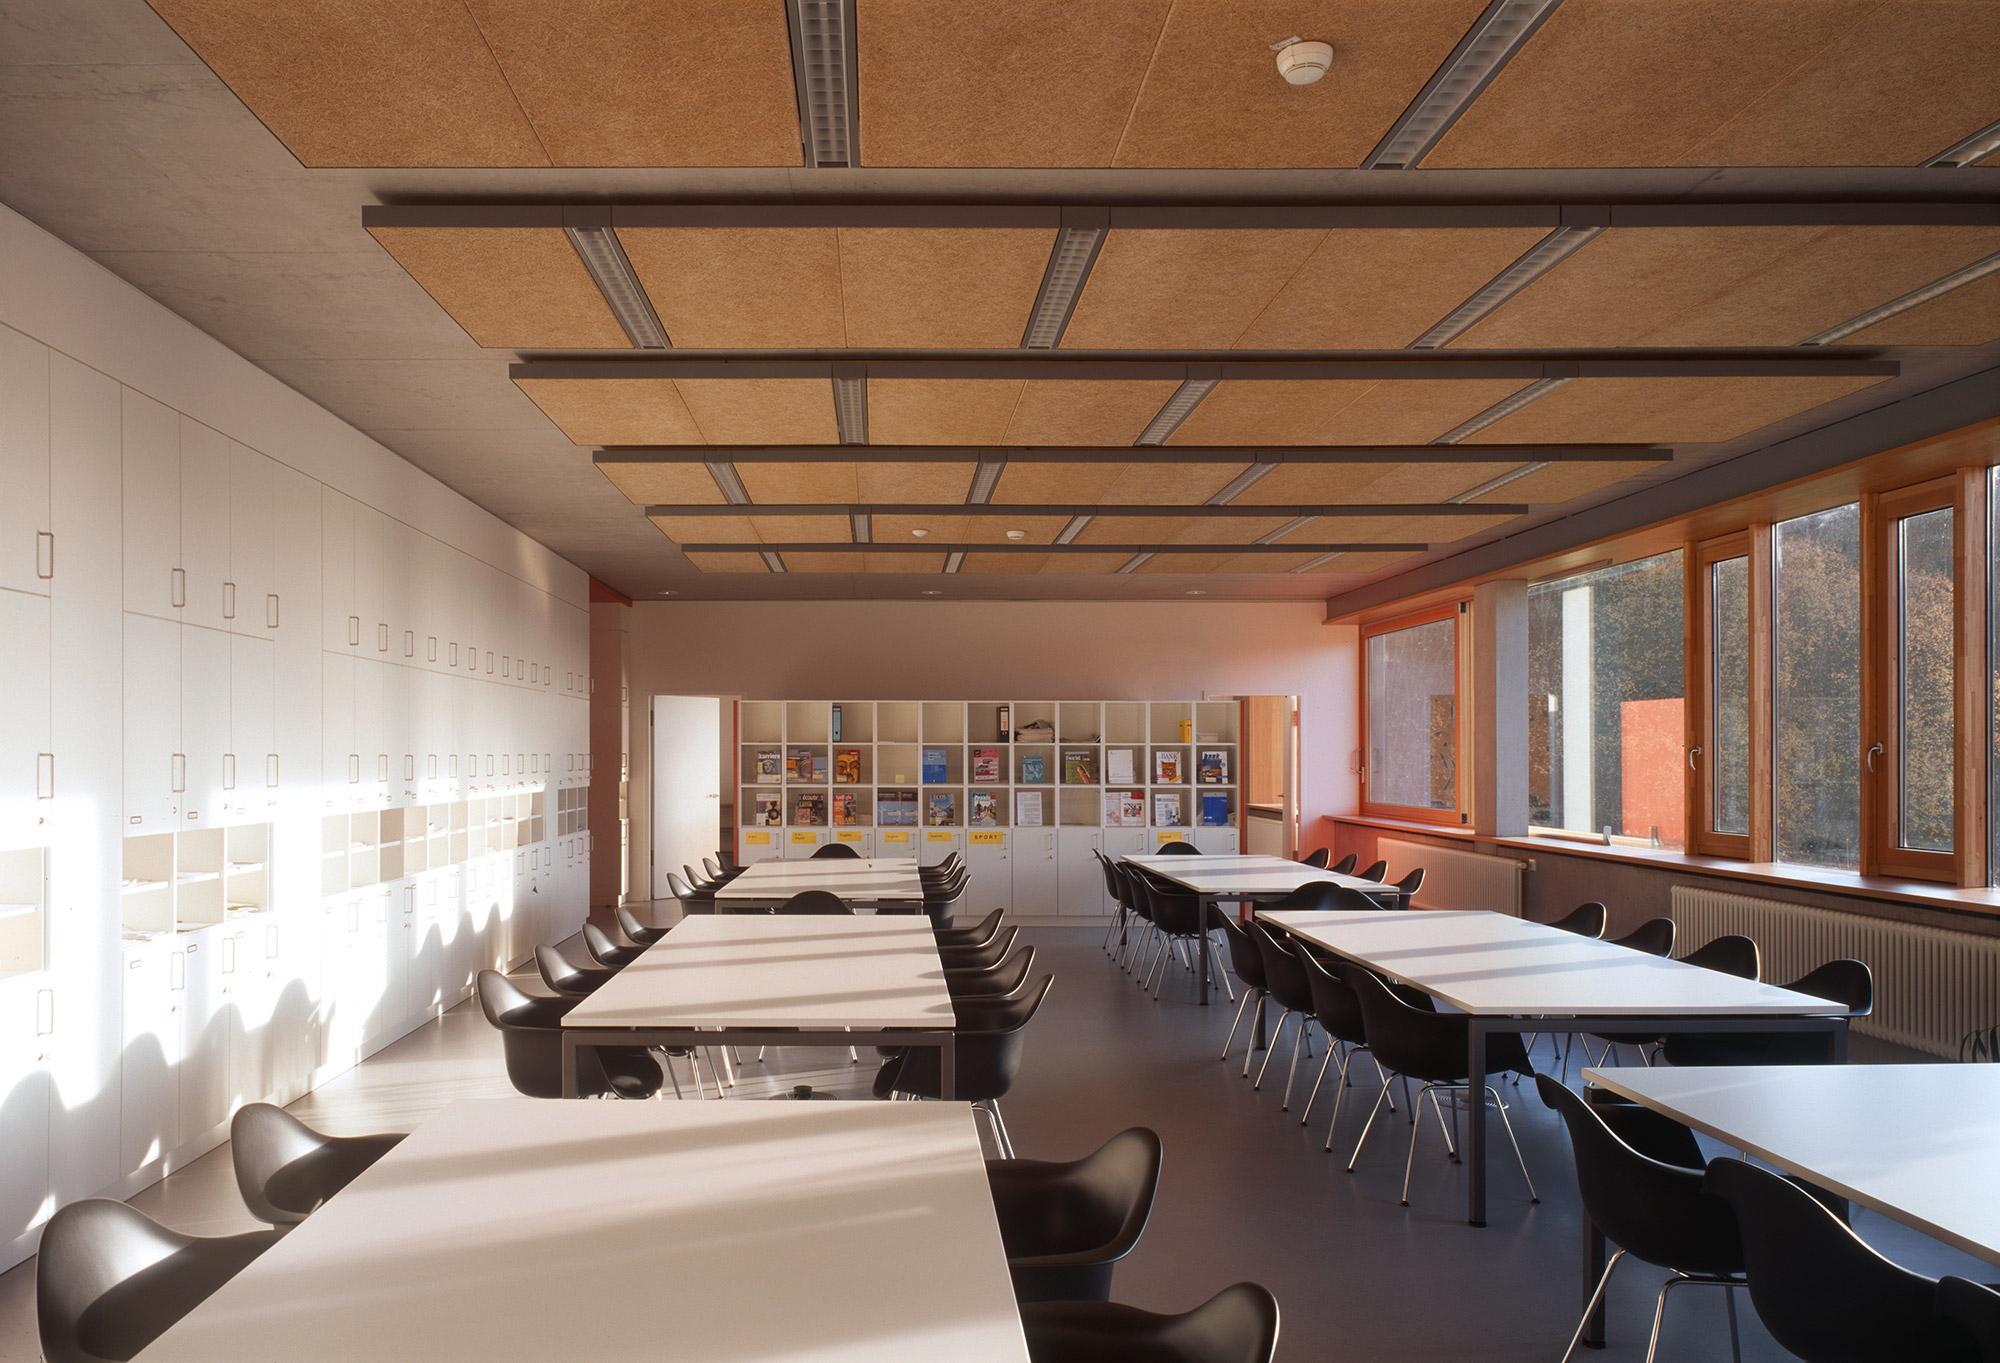 Architekt Sigmaringen kss v architekten köln